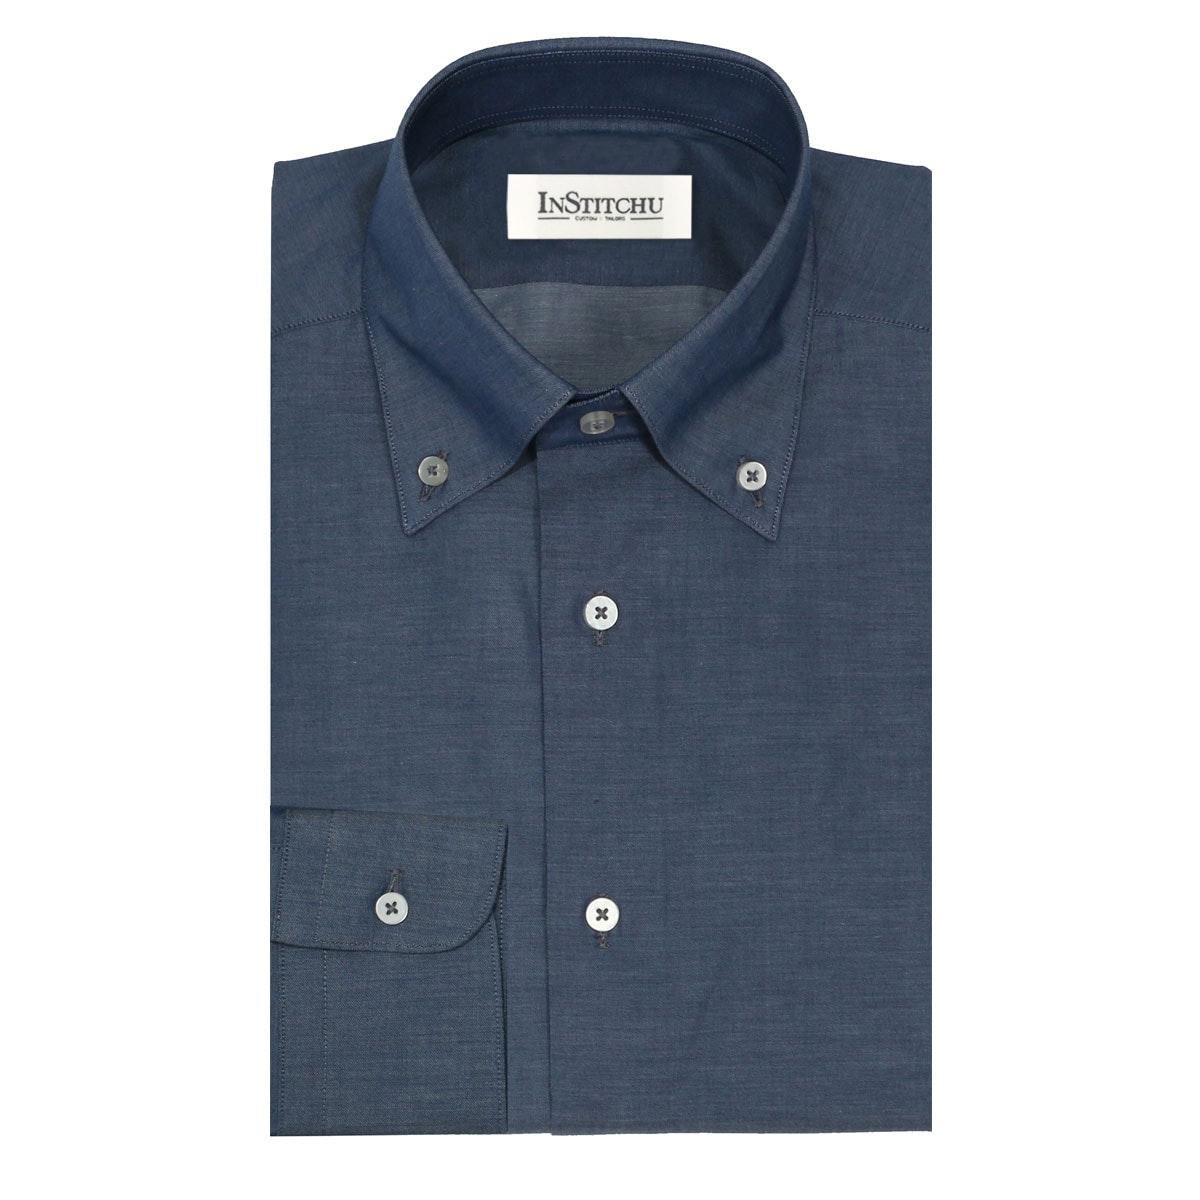 InStitchu Collection The Balnarring Dark Blue Shirt